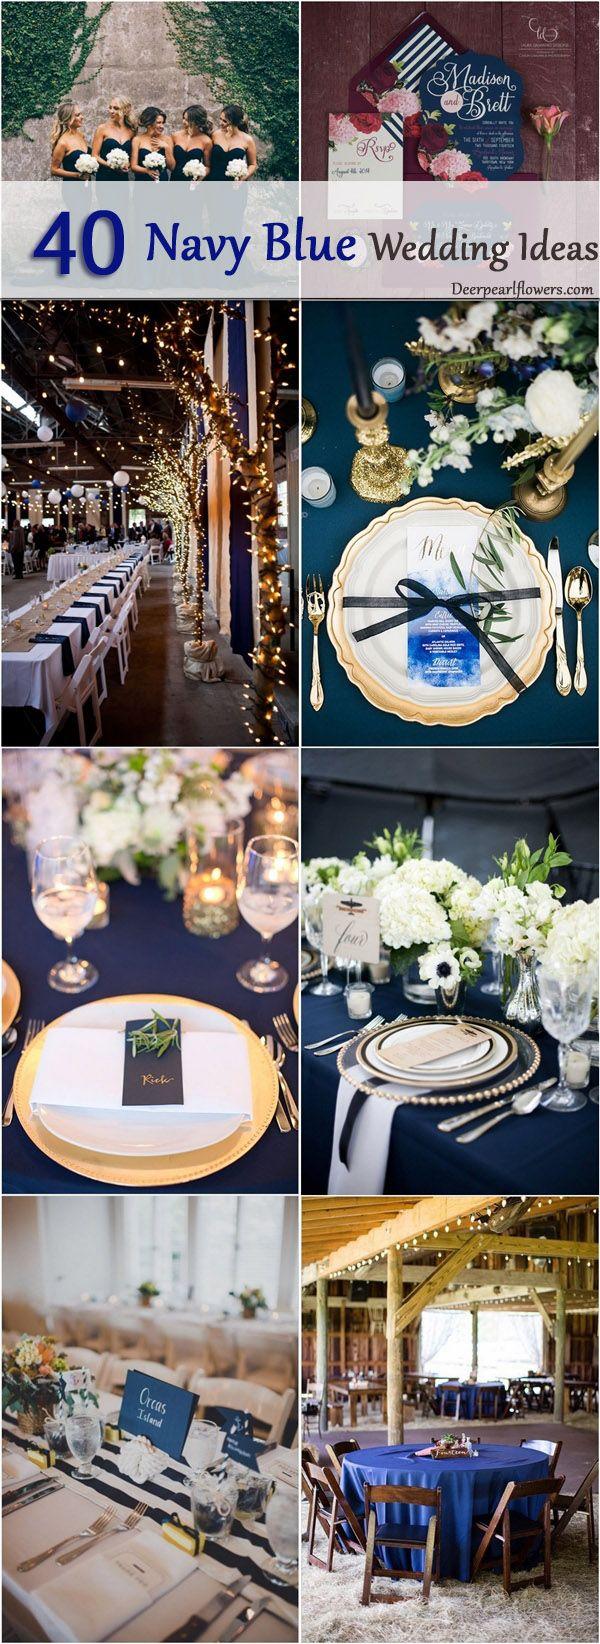 Blue themed wedding decor   best Wedding images on Pinterest  Wedding ideas Weddings and